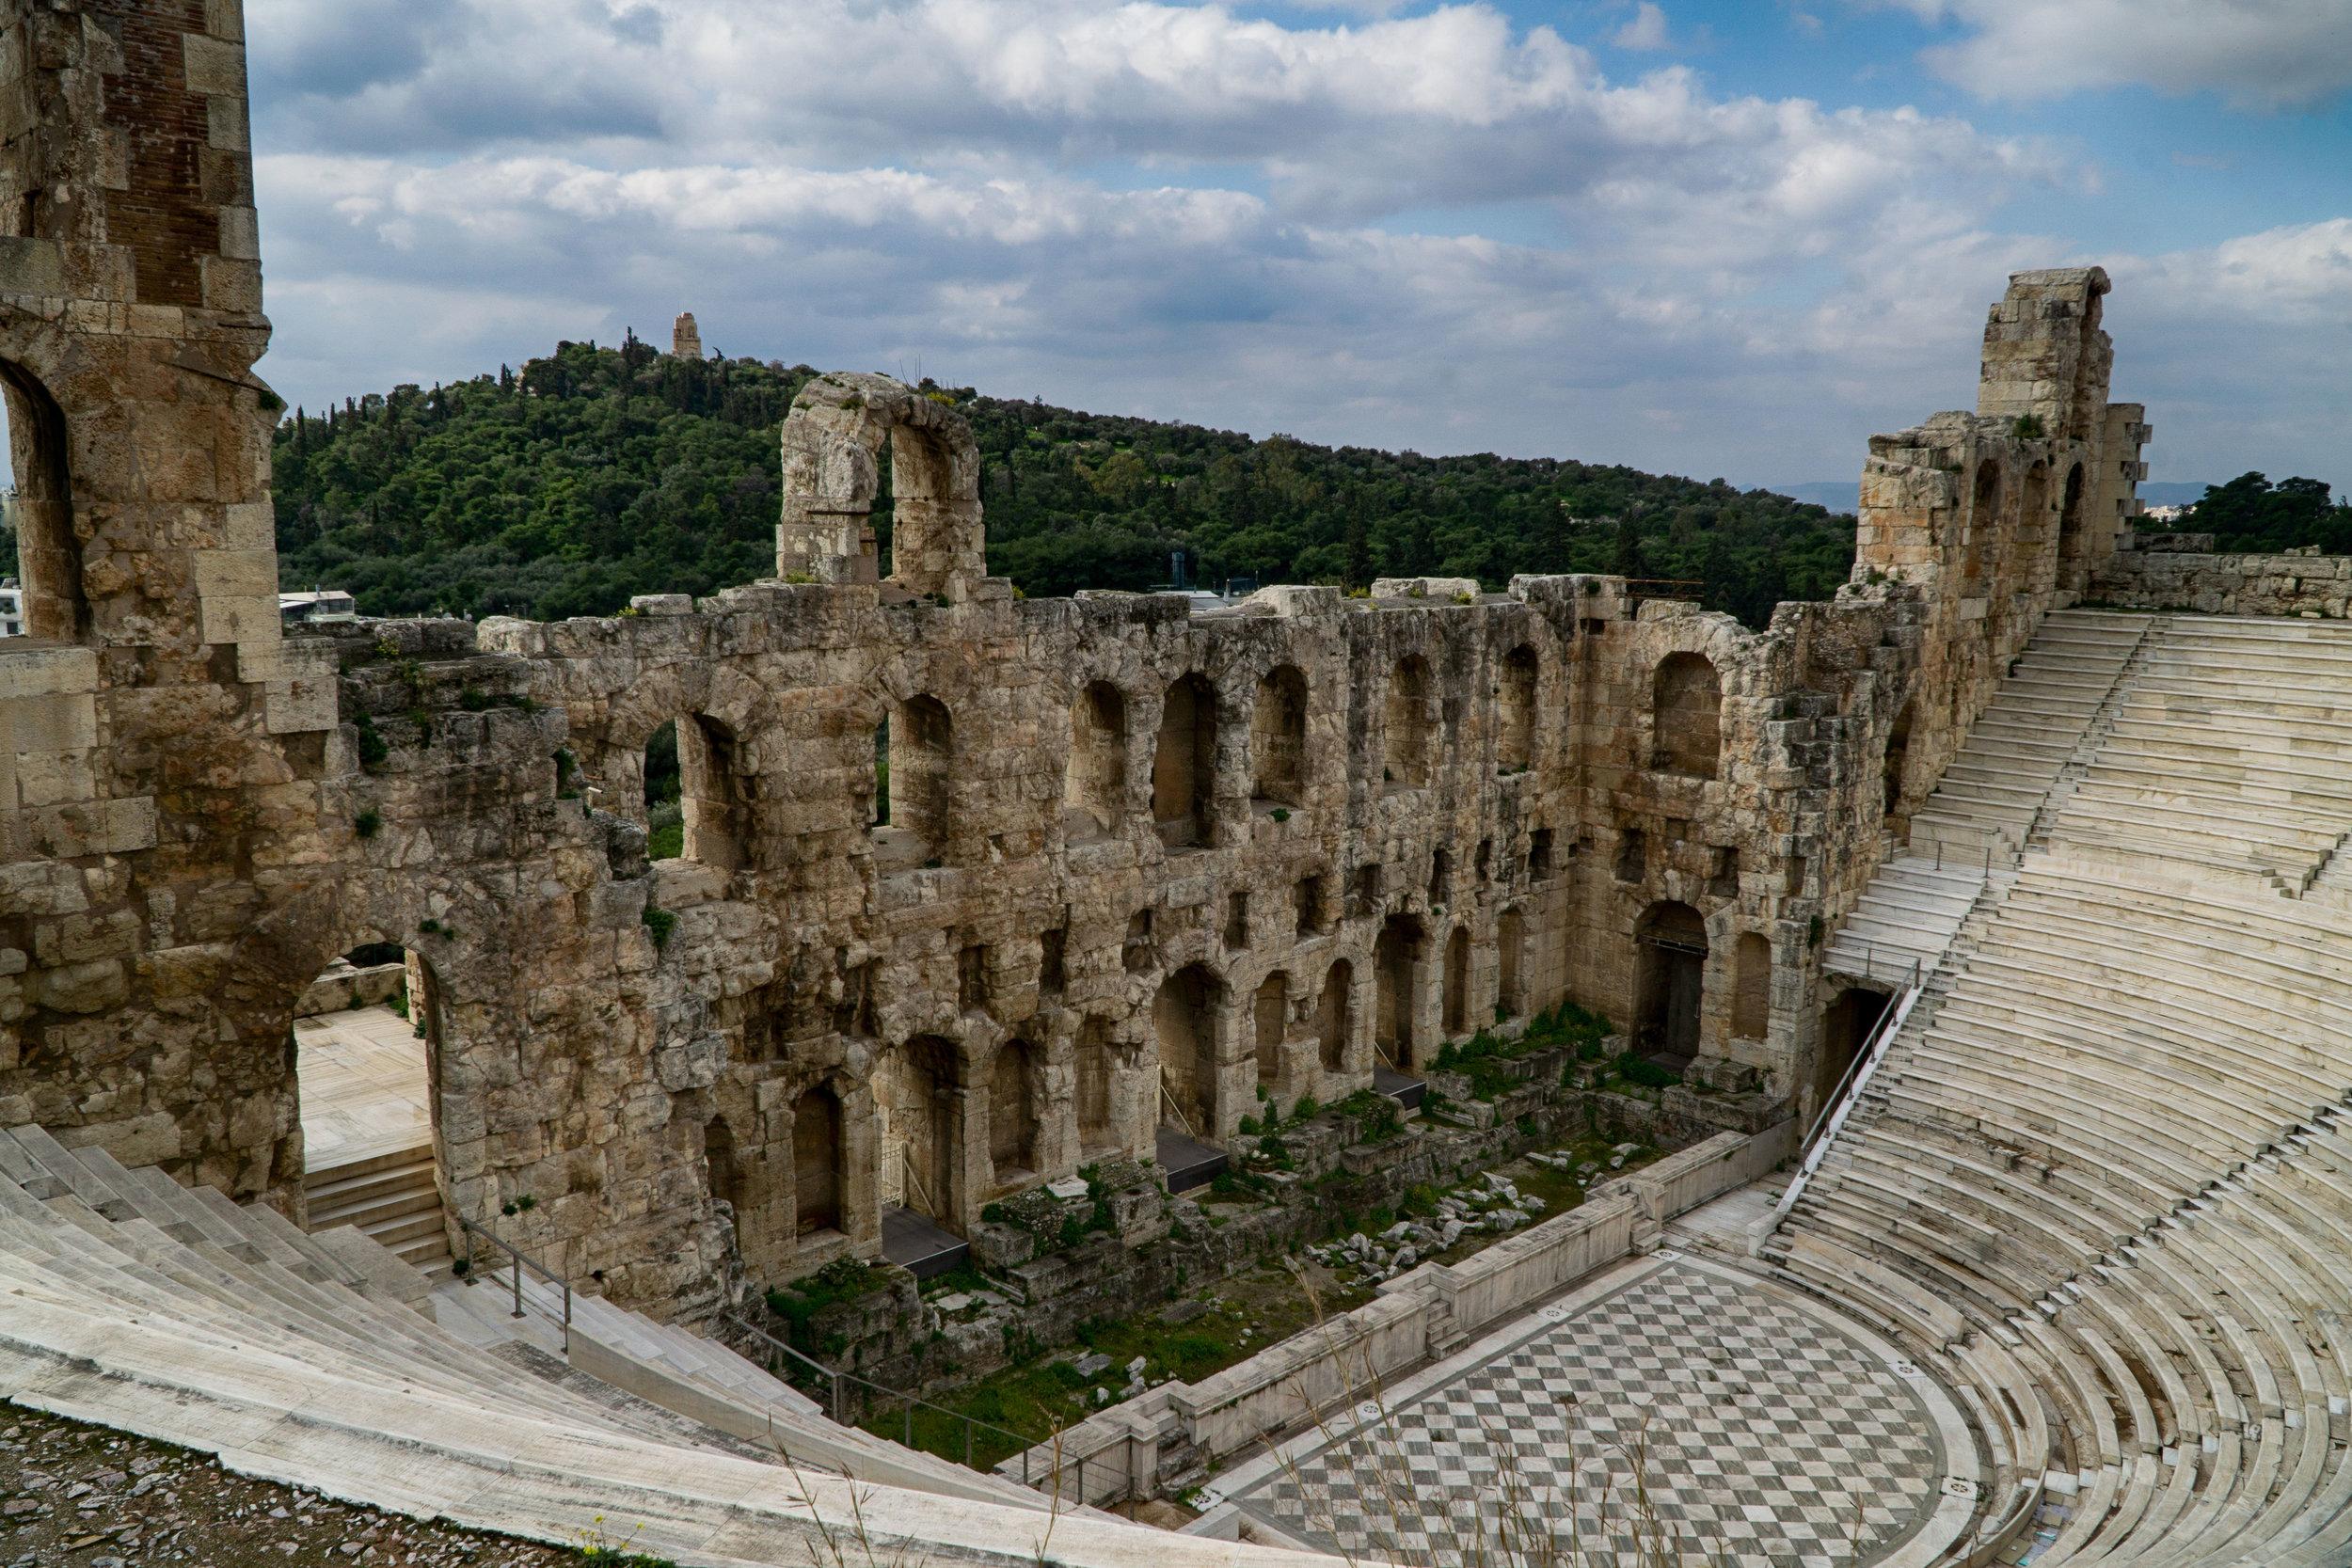 athens_acropolis_vickygood_travel_photography7sm.jpg